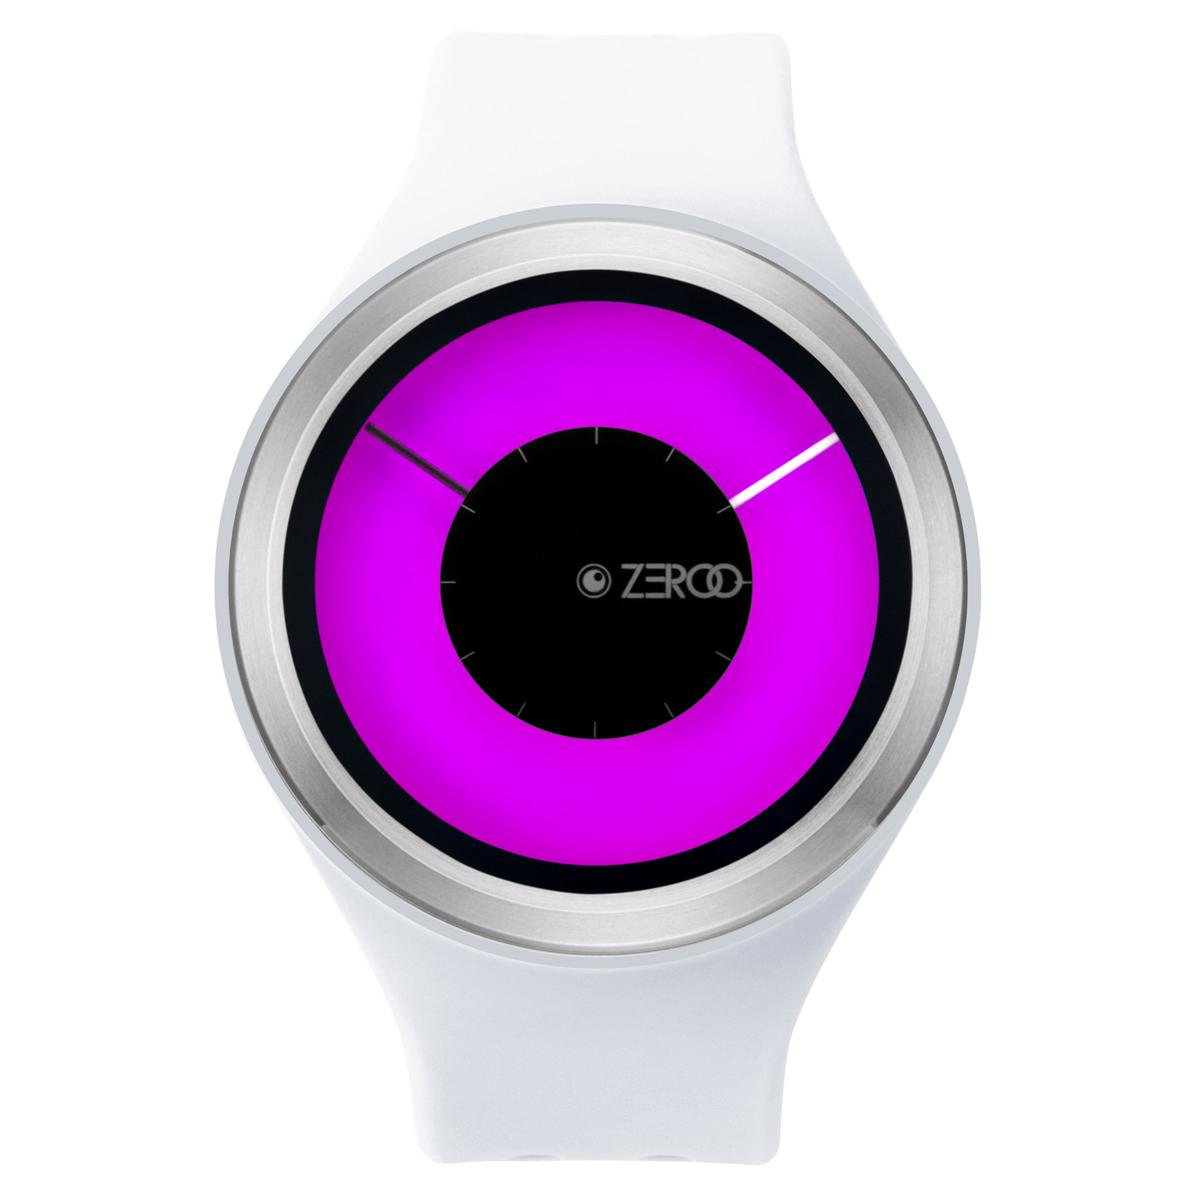 ZEROO MAGIA AURORA ゼロ 電池式クォーツ 腕時計 [W00801B01SR01] ホワイト デザインウォッチ ペア用 メンズ レディース ユニセックス おしゃれ時計 デザイナーズ